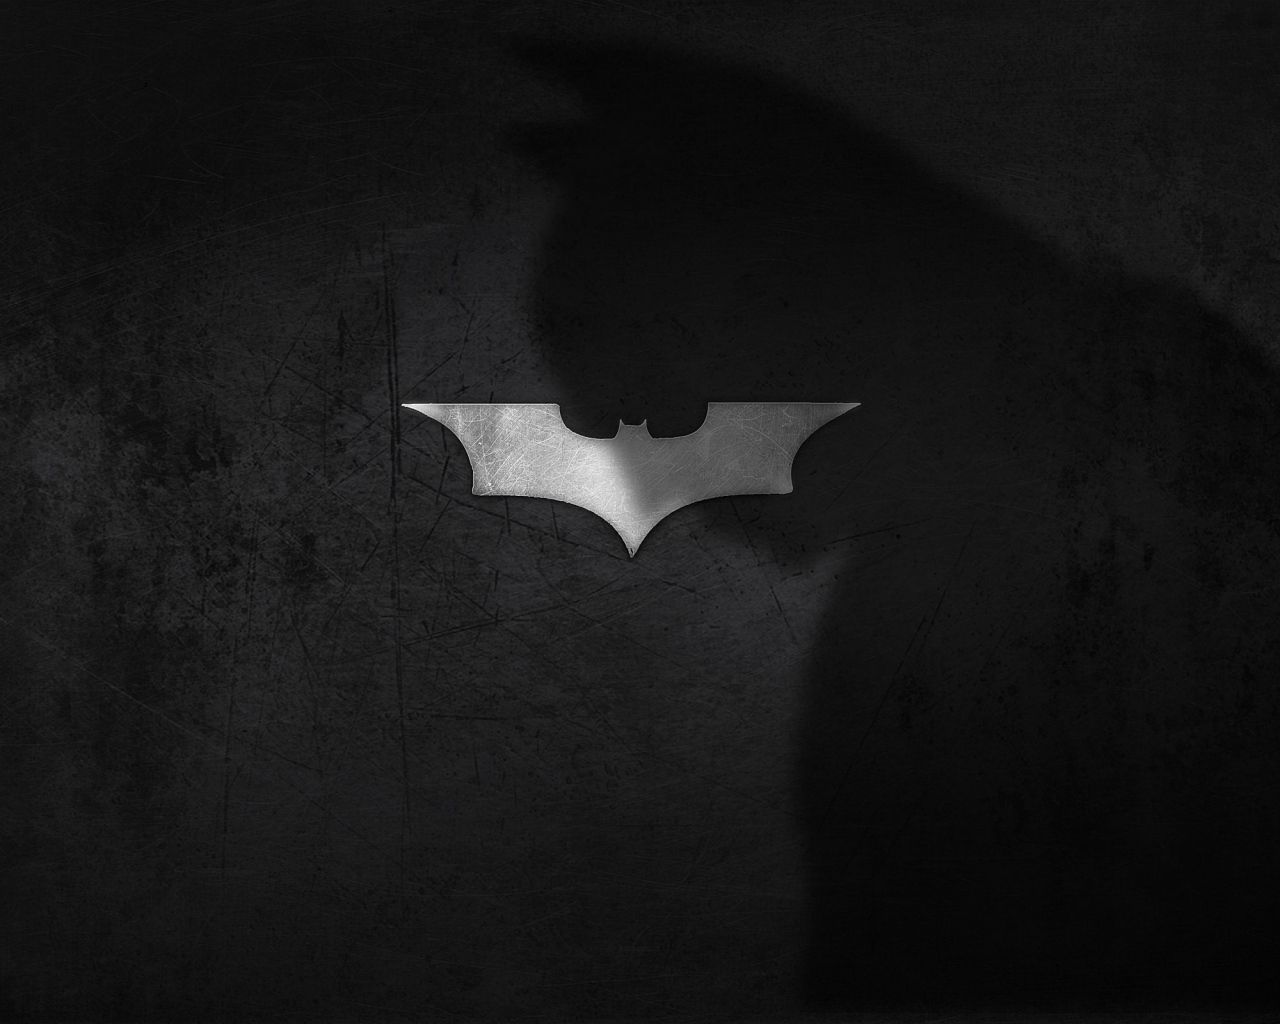 Download Wallpaper 1280x1024 Shadow Logo Batman Dark Knight 1280x1024 Hd Background Nature Desktop Wallpaper Batman Batman Dark